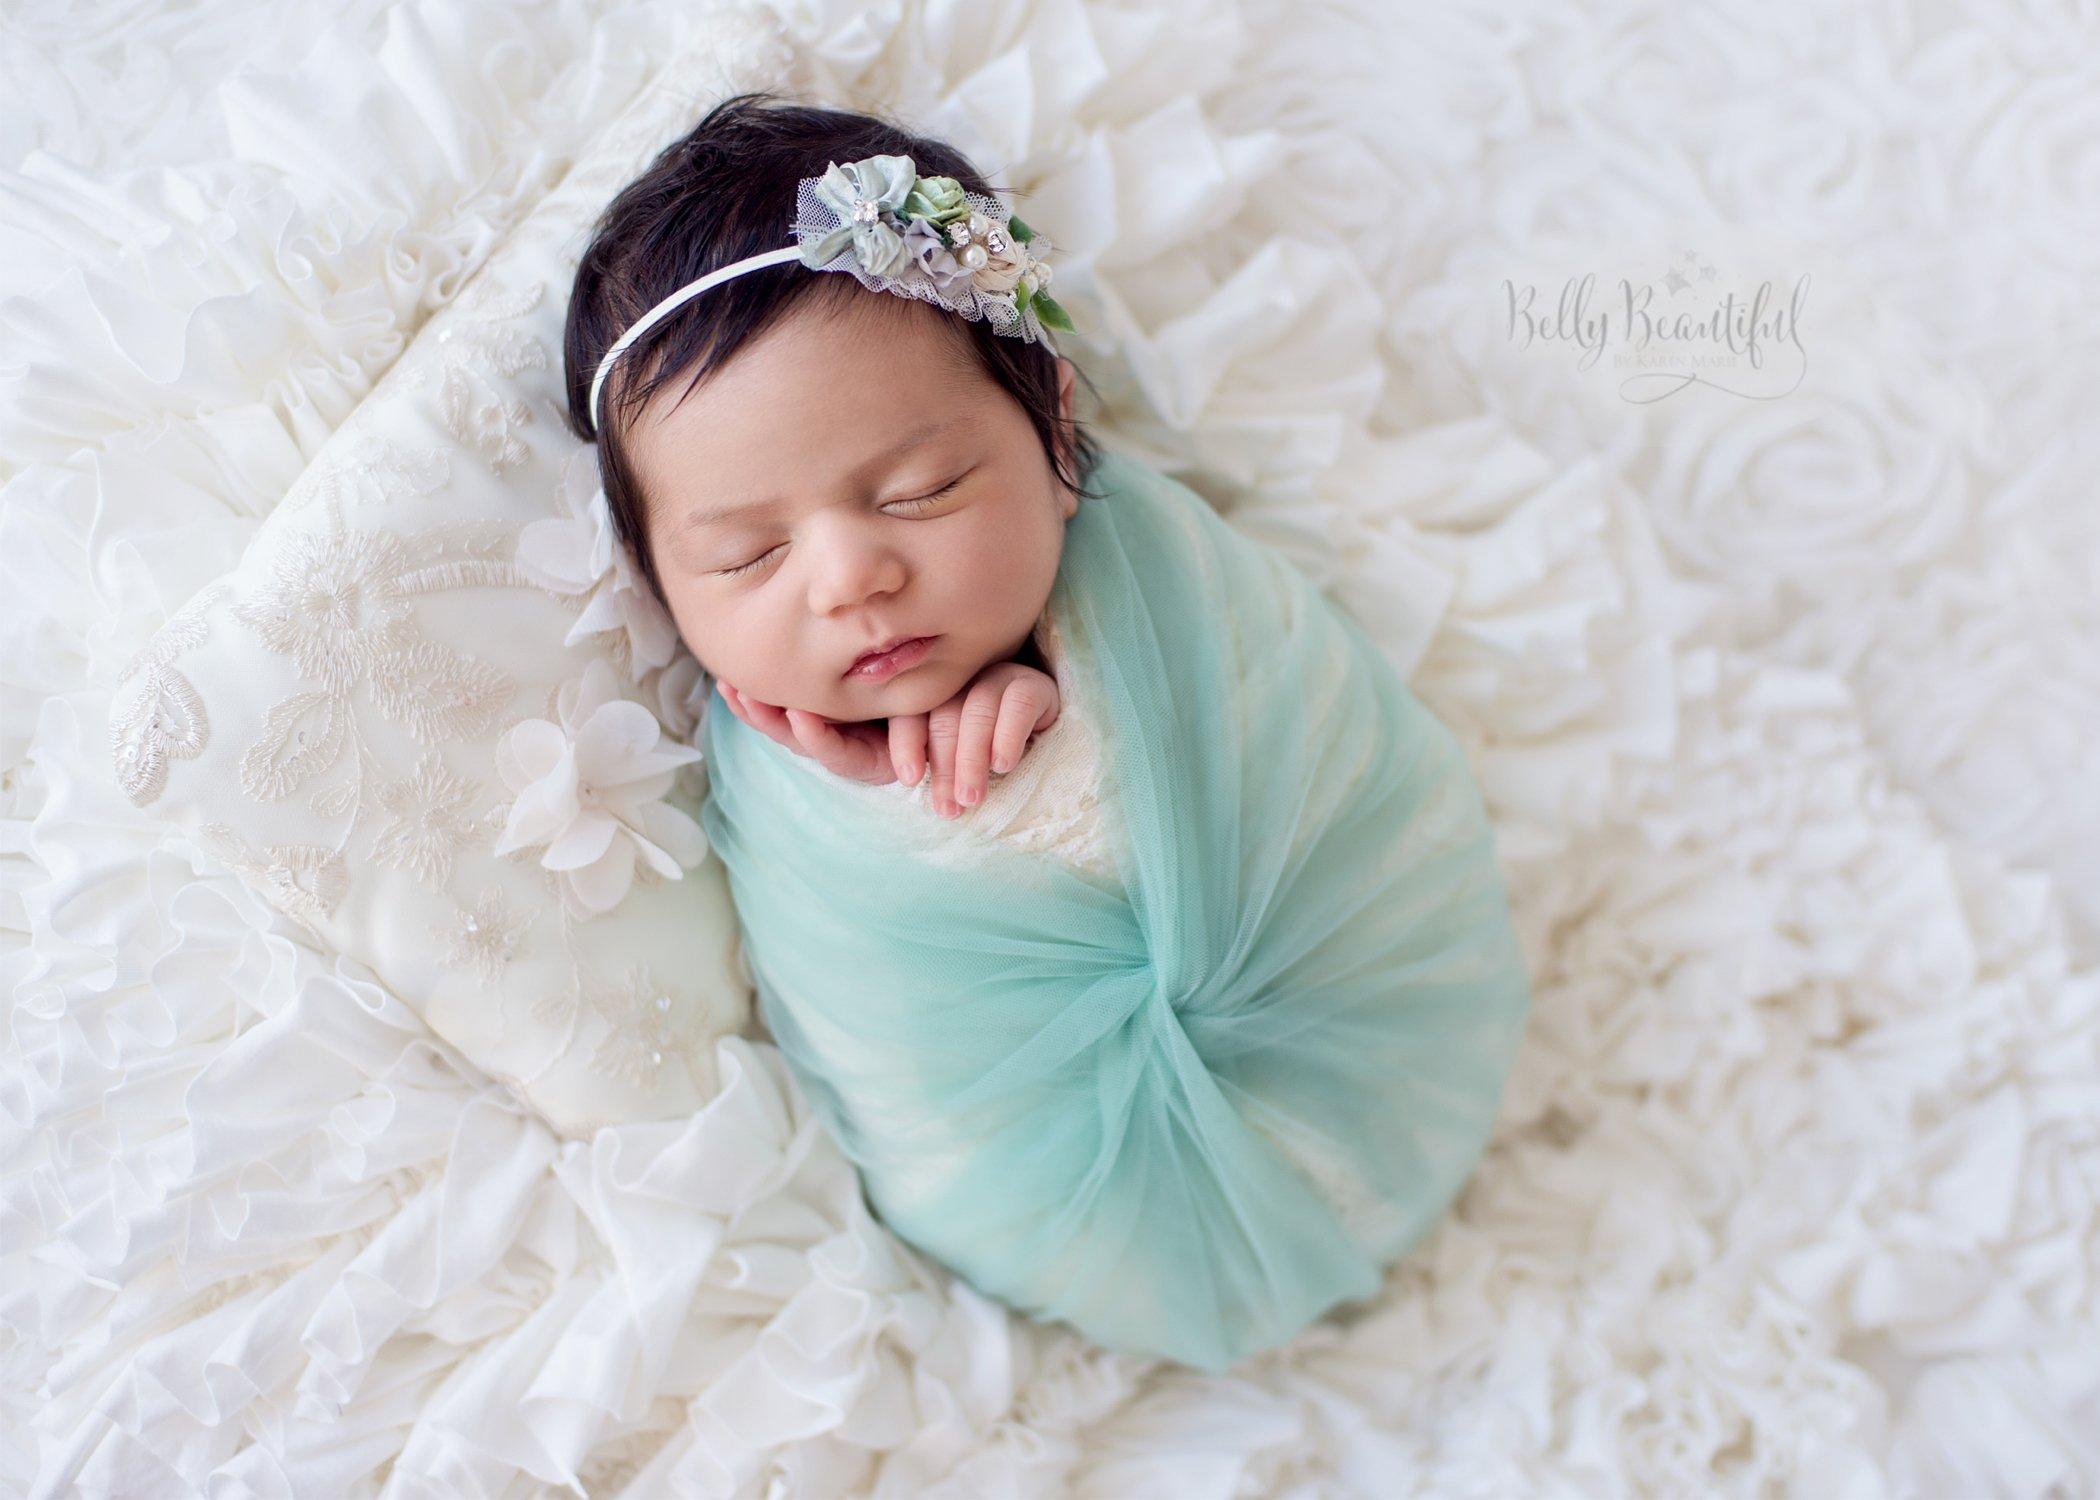 newborn photography gear image